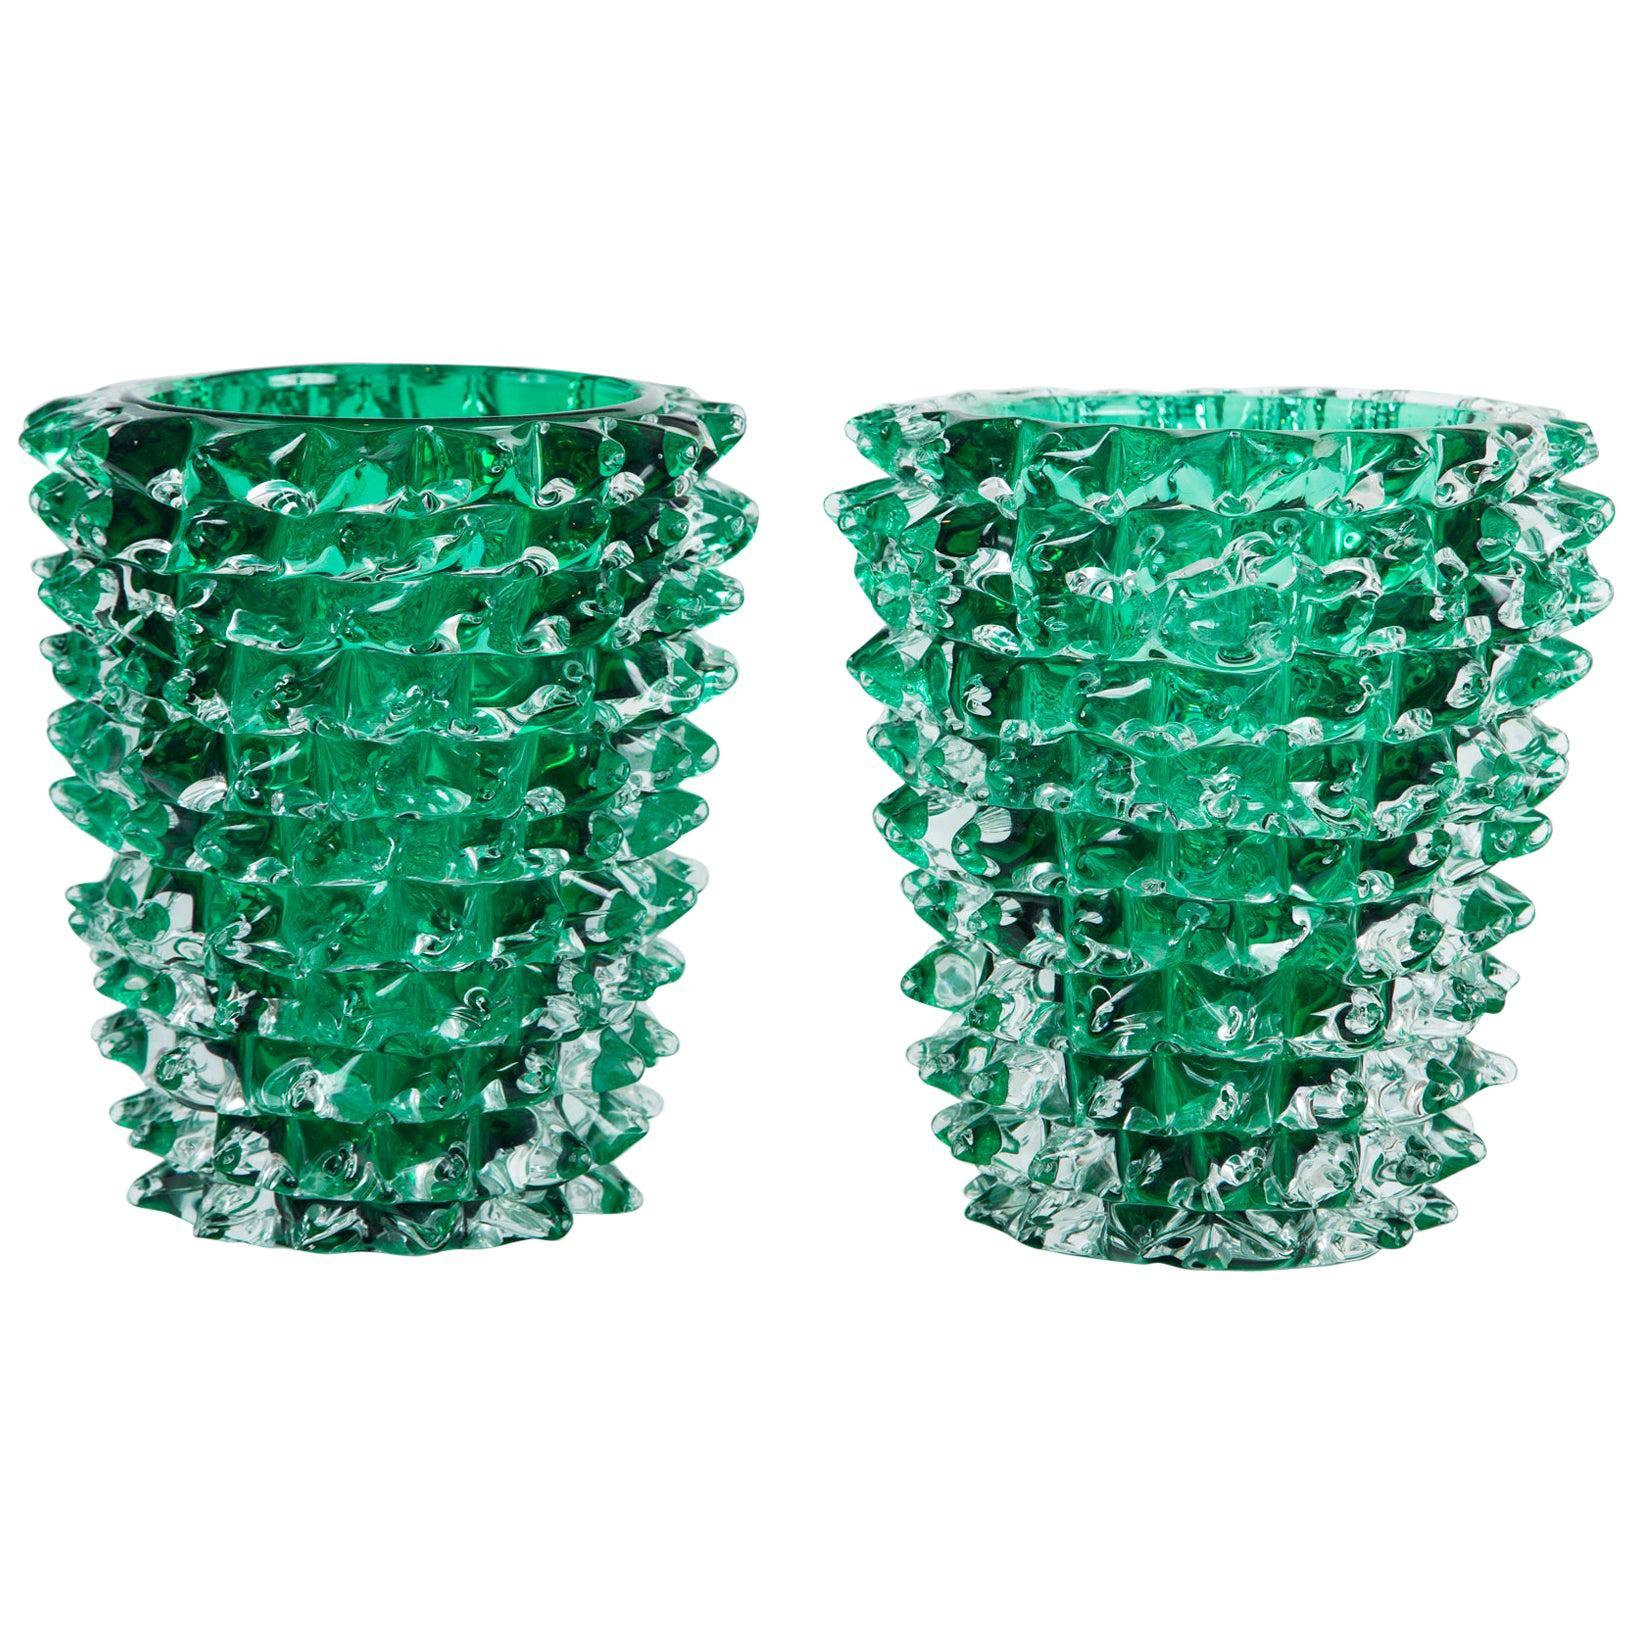 Paolo Crepax Murano Green Glass Vase